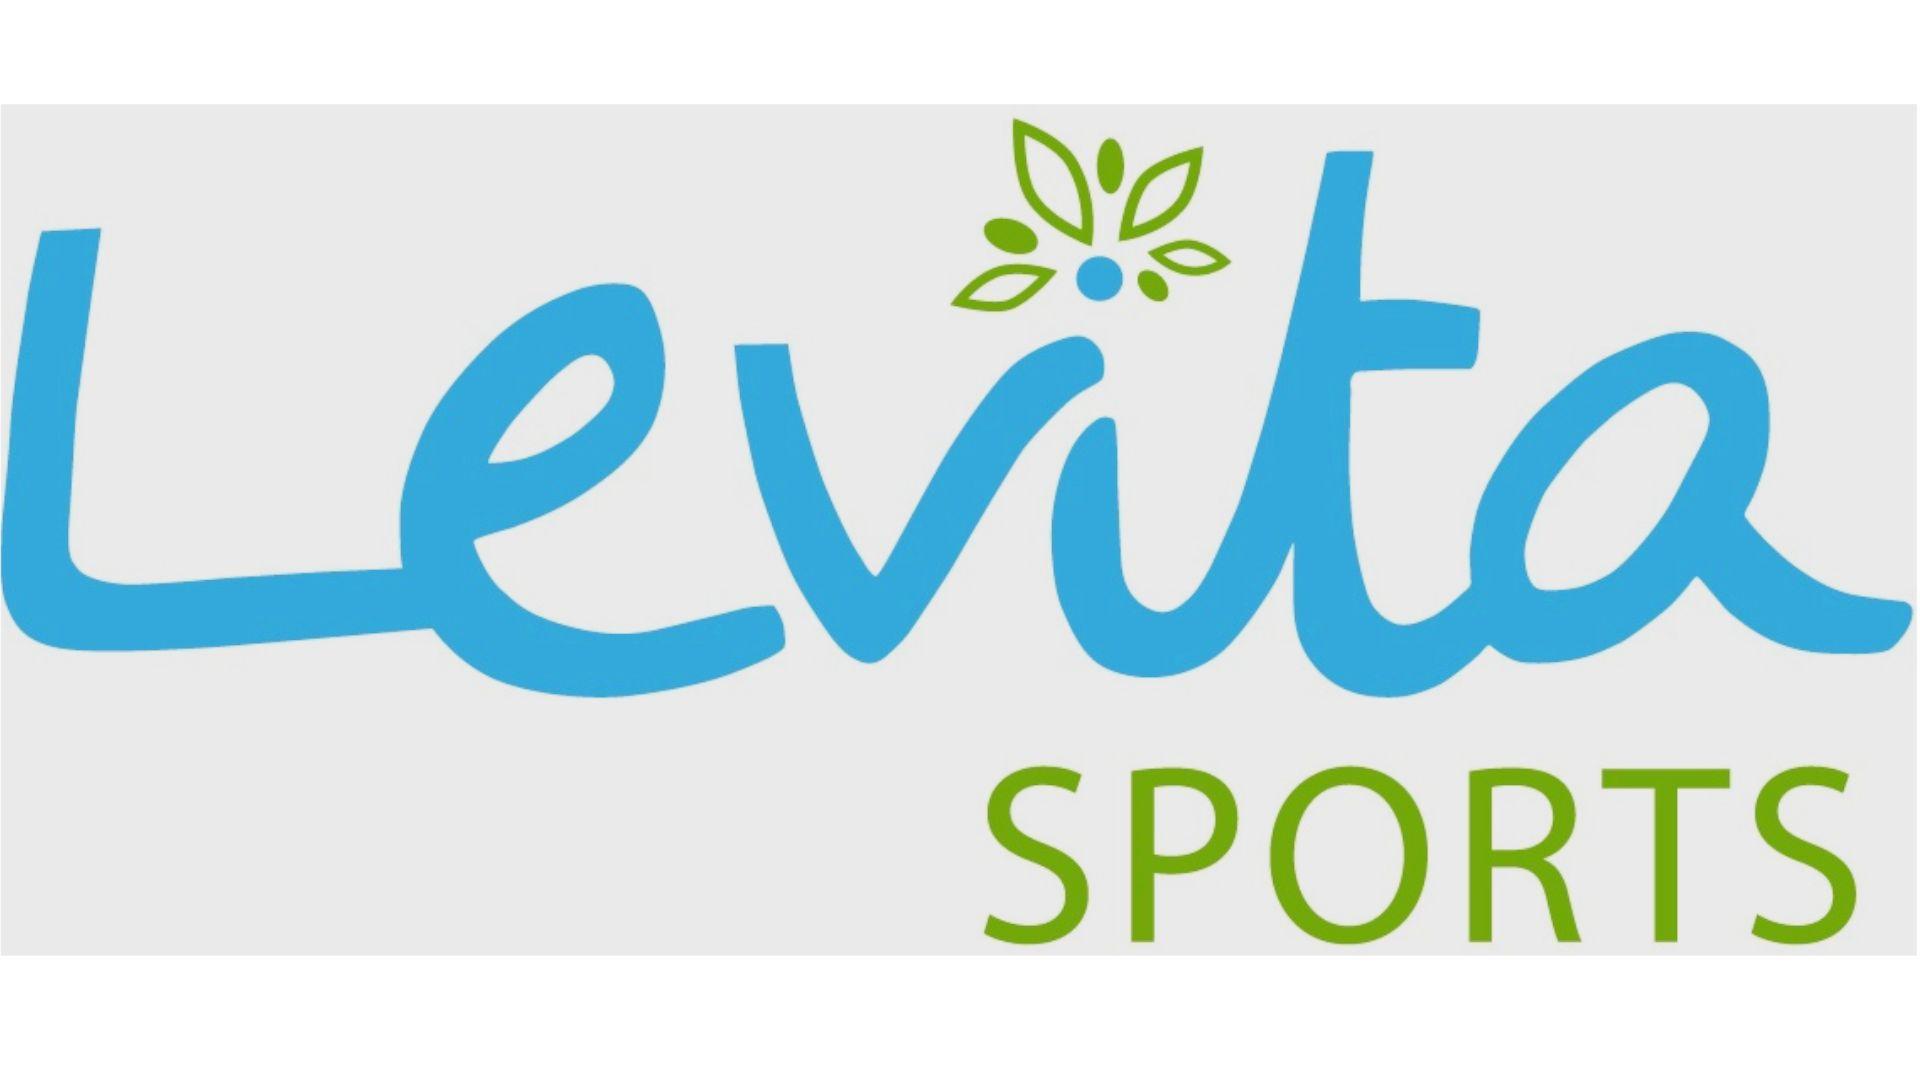 Levita Sports